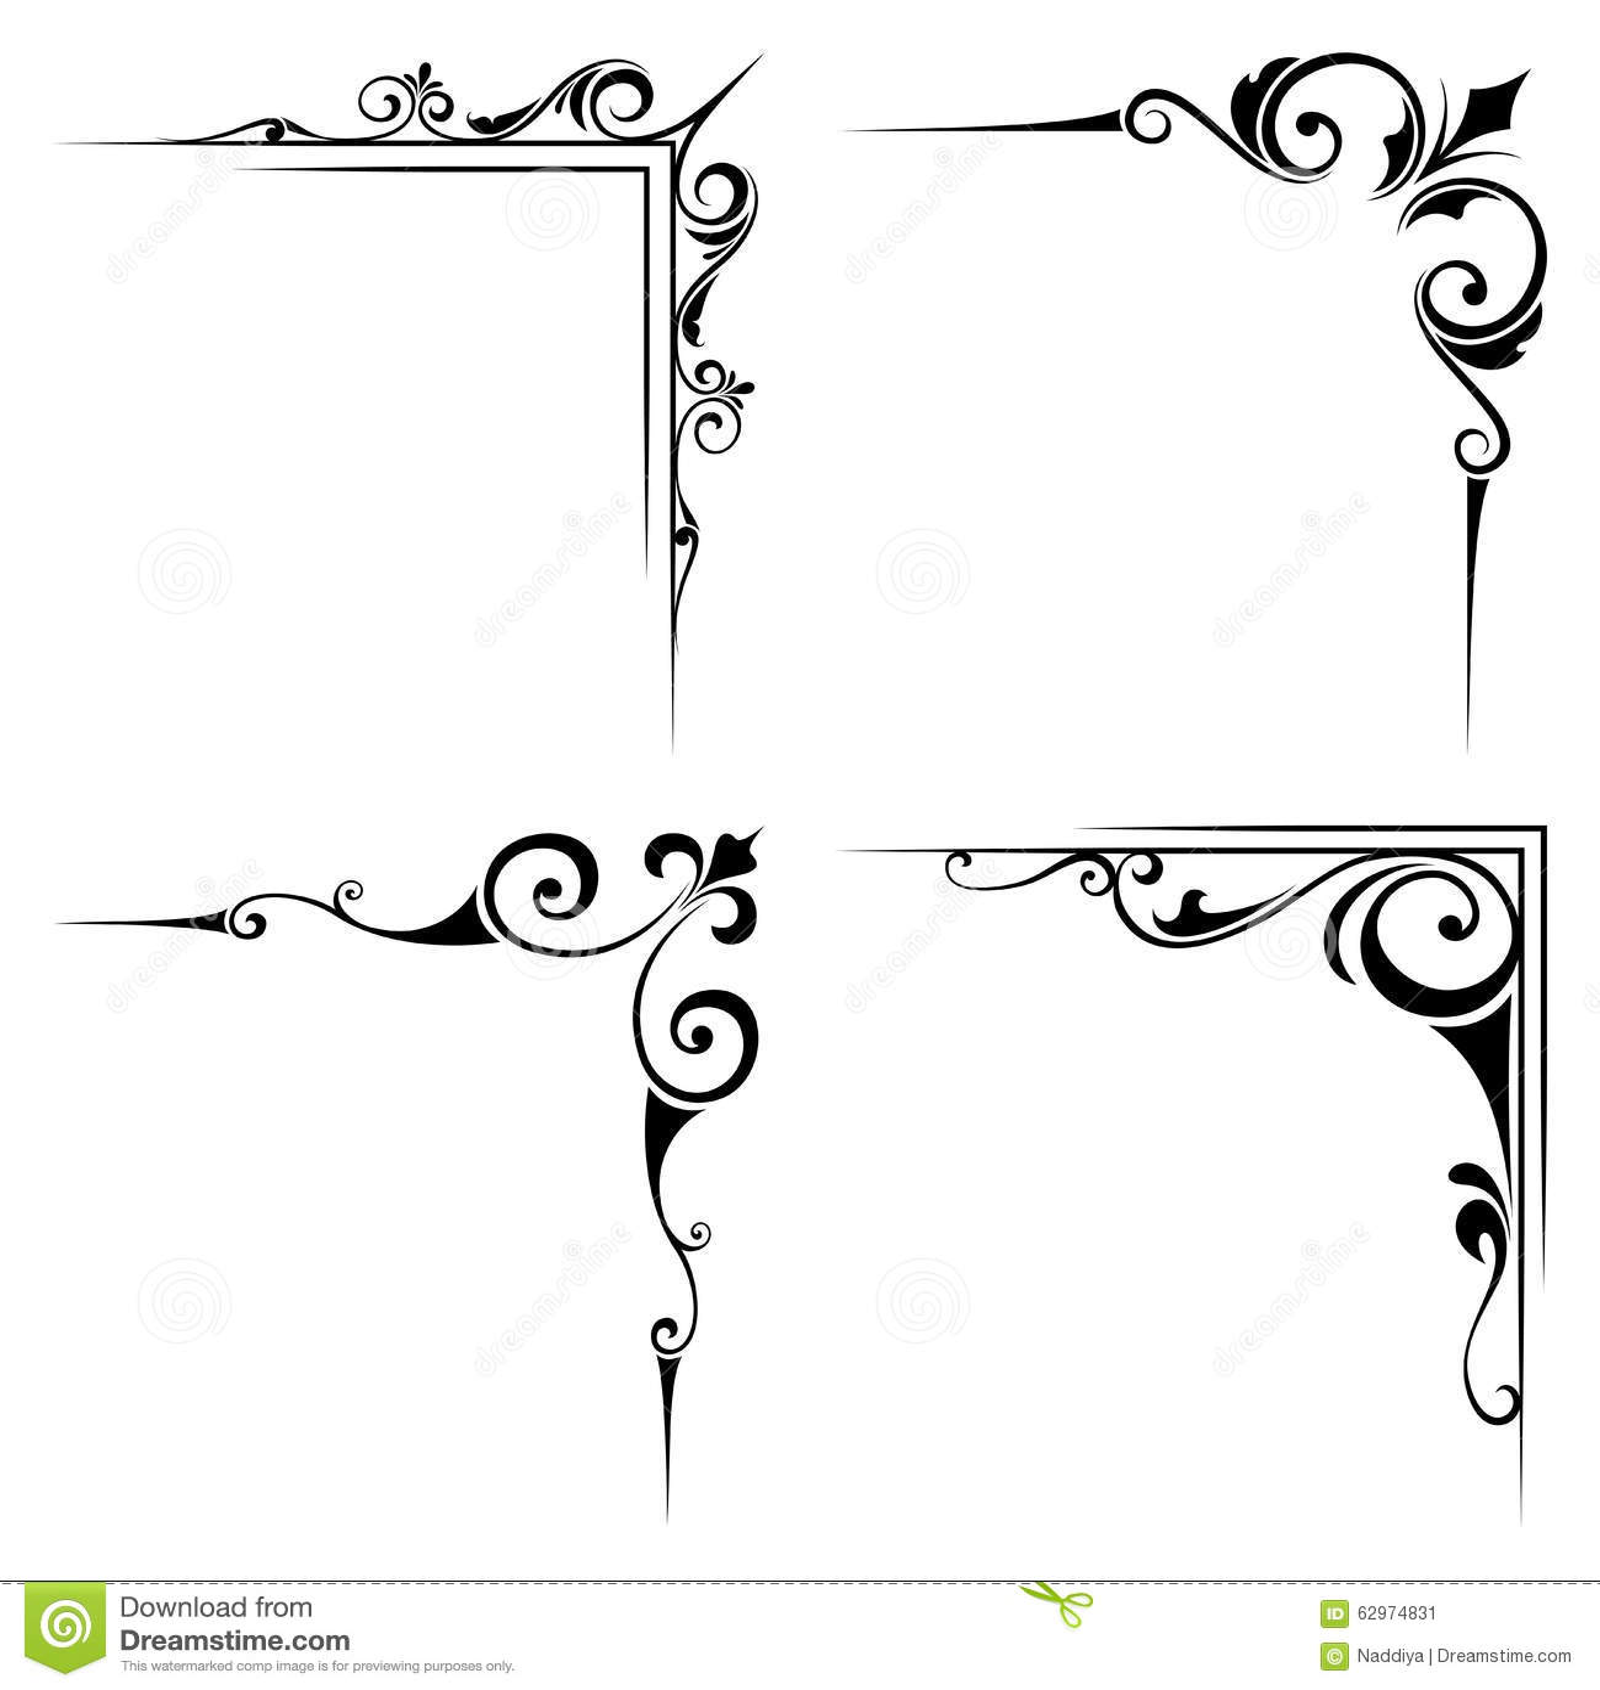 Calligraphic Decorative Black Corner Elements. Vector ...